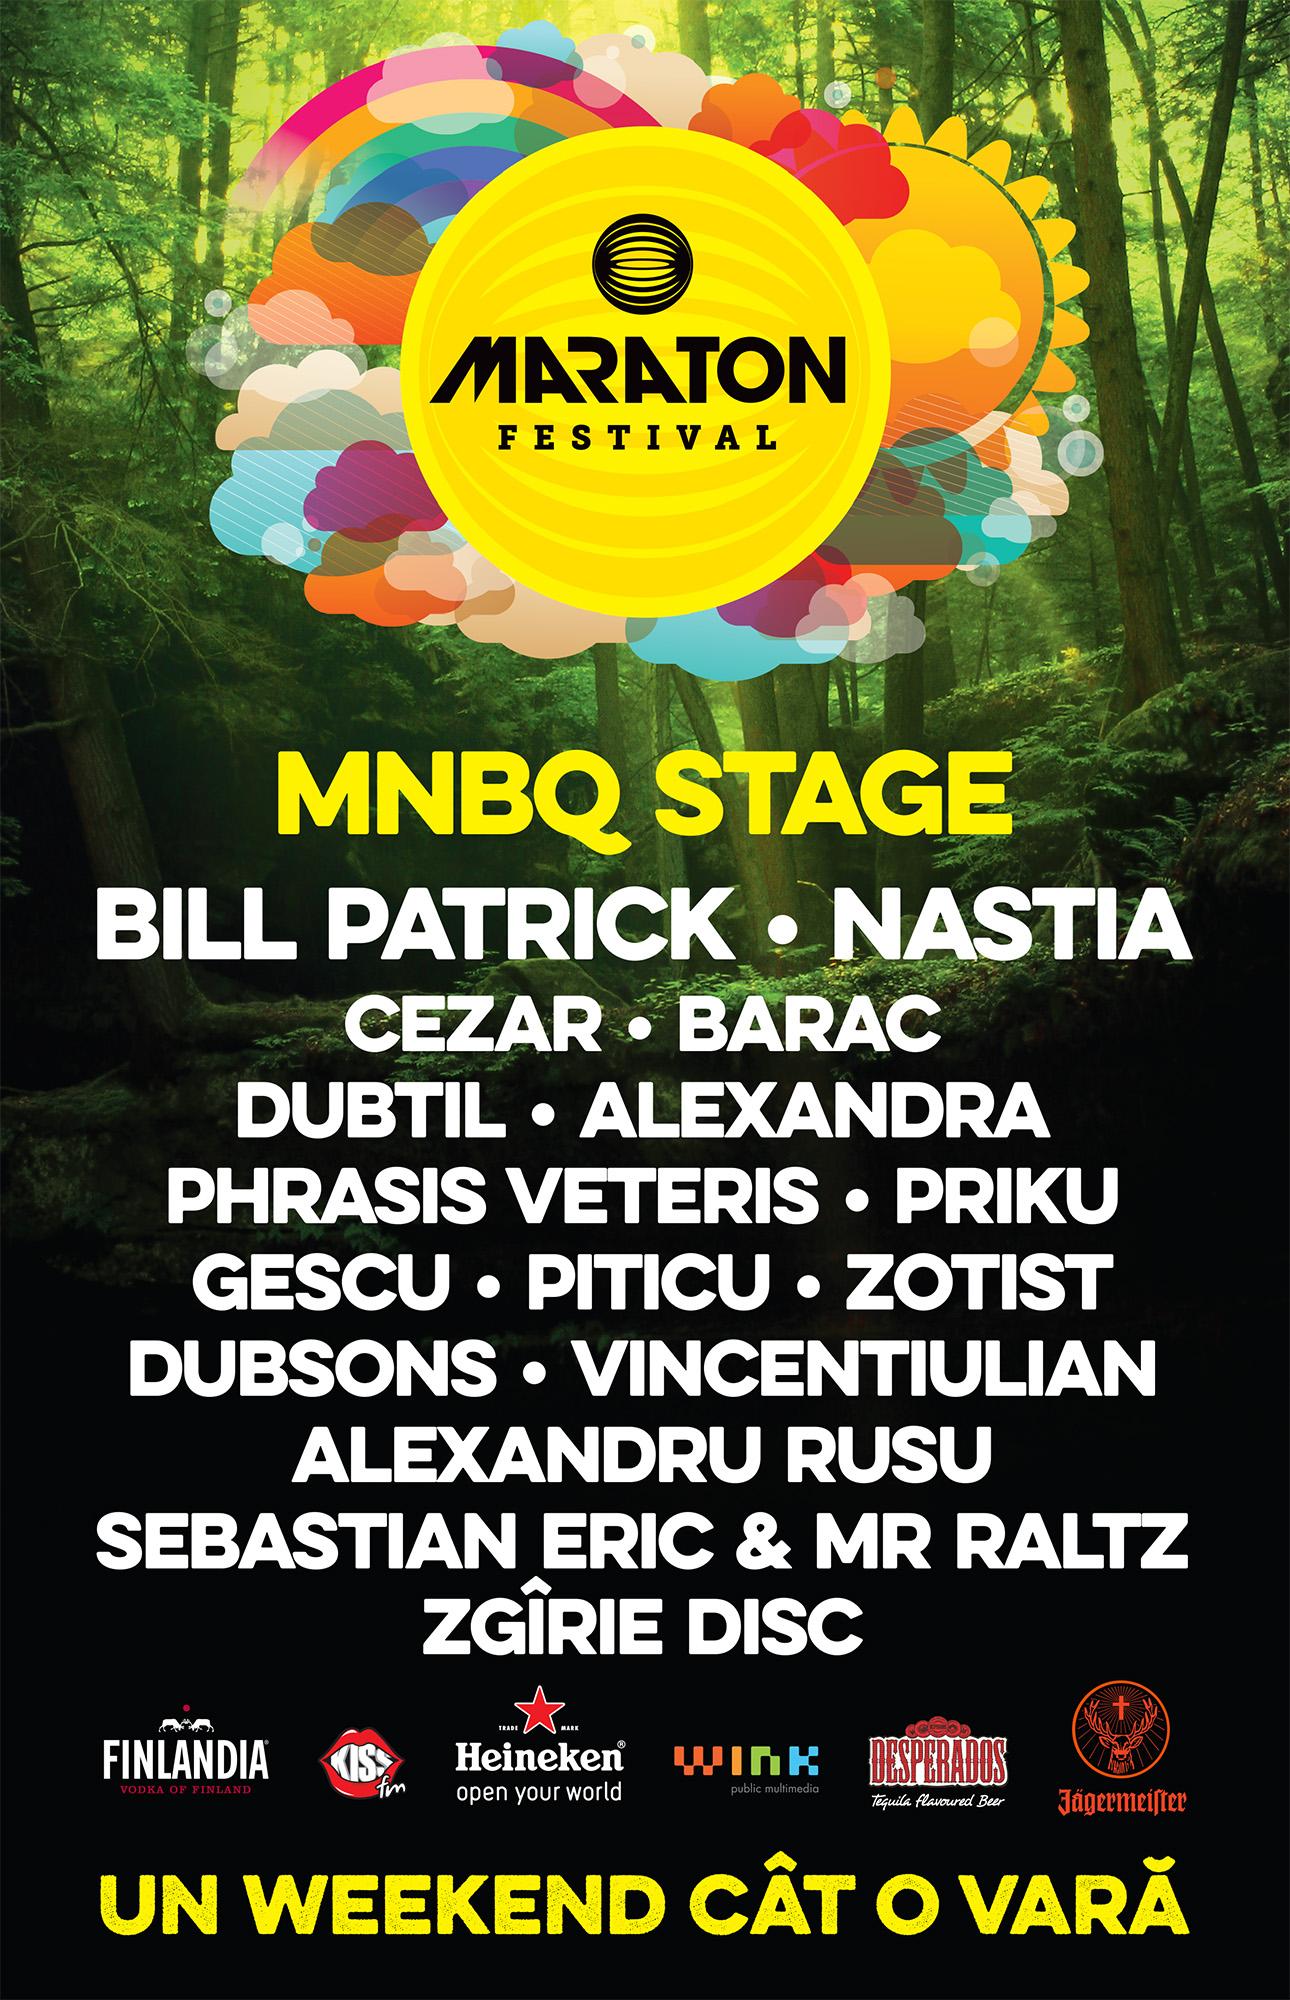 maraton 2014 line-up